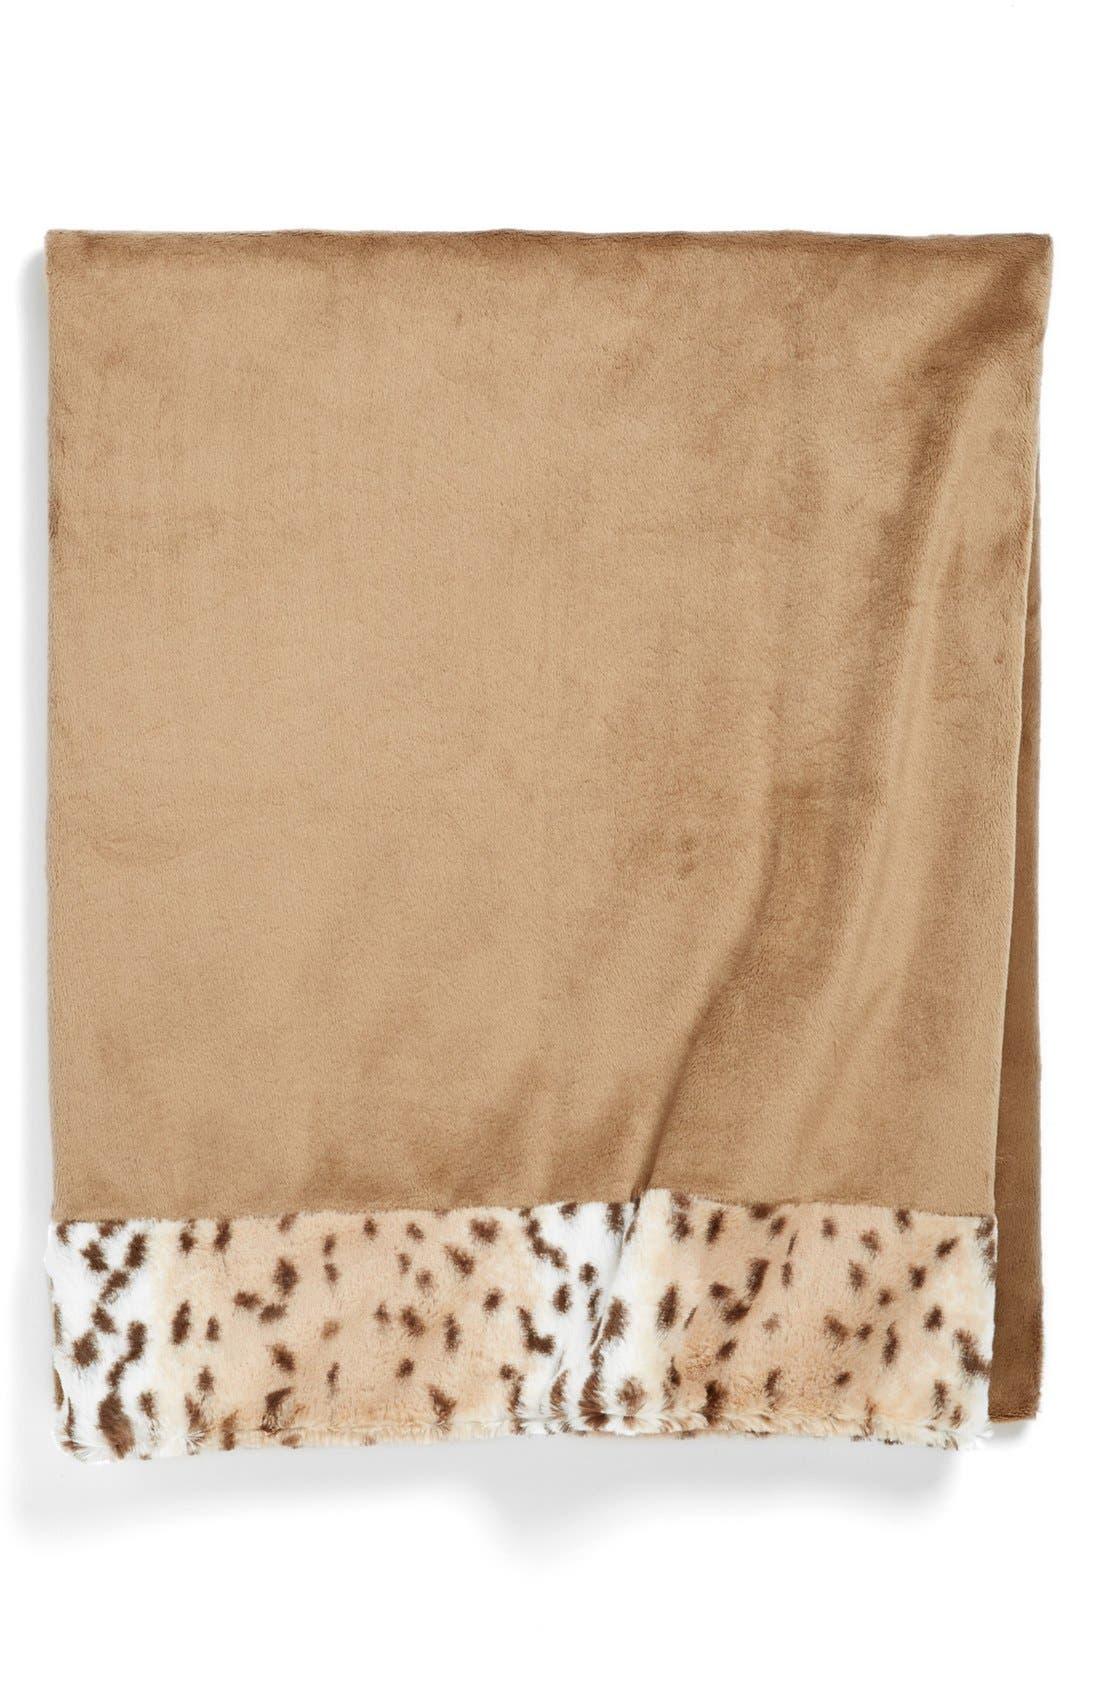 Alternate Image 1 Selected - Sonoma Lavender 'Snow Leopard' Blanket